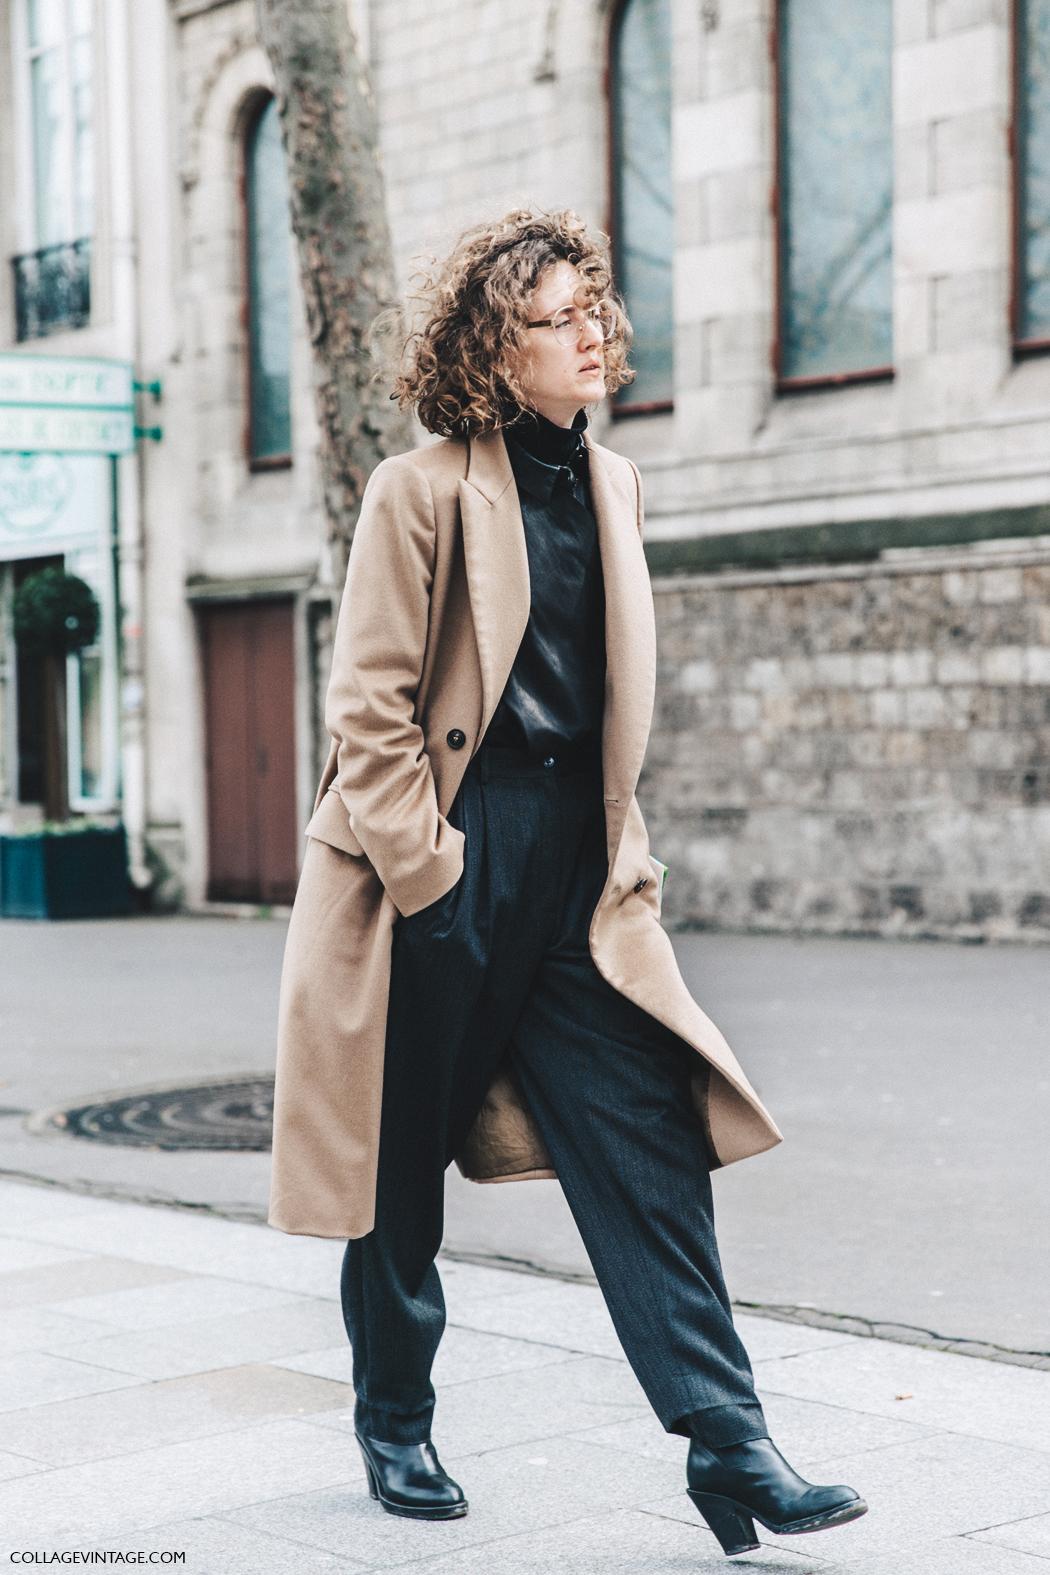 PFW-Paris_Fashion_Week_Fall_2016-Street_Style-Collage_Vintage-Camel_Coat-Black-1